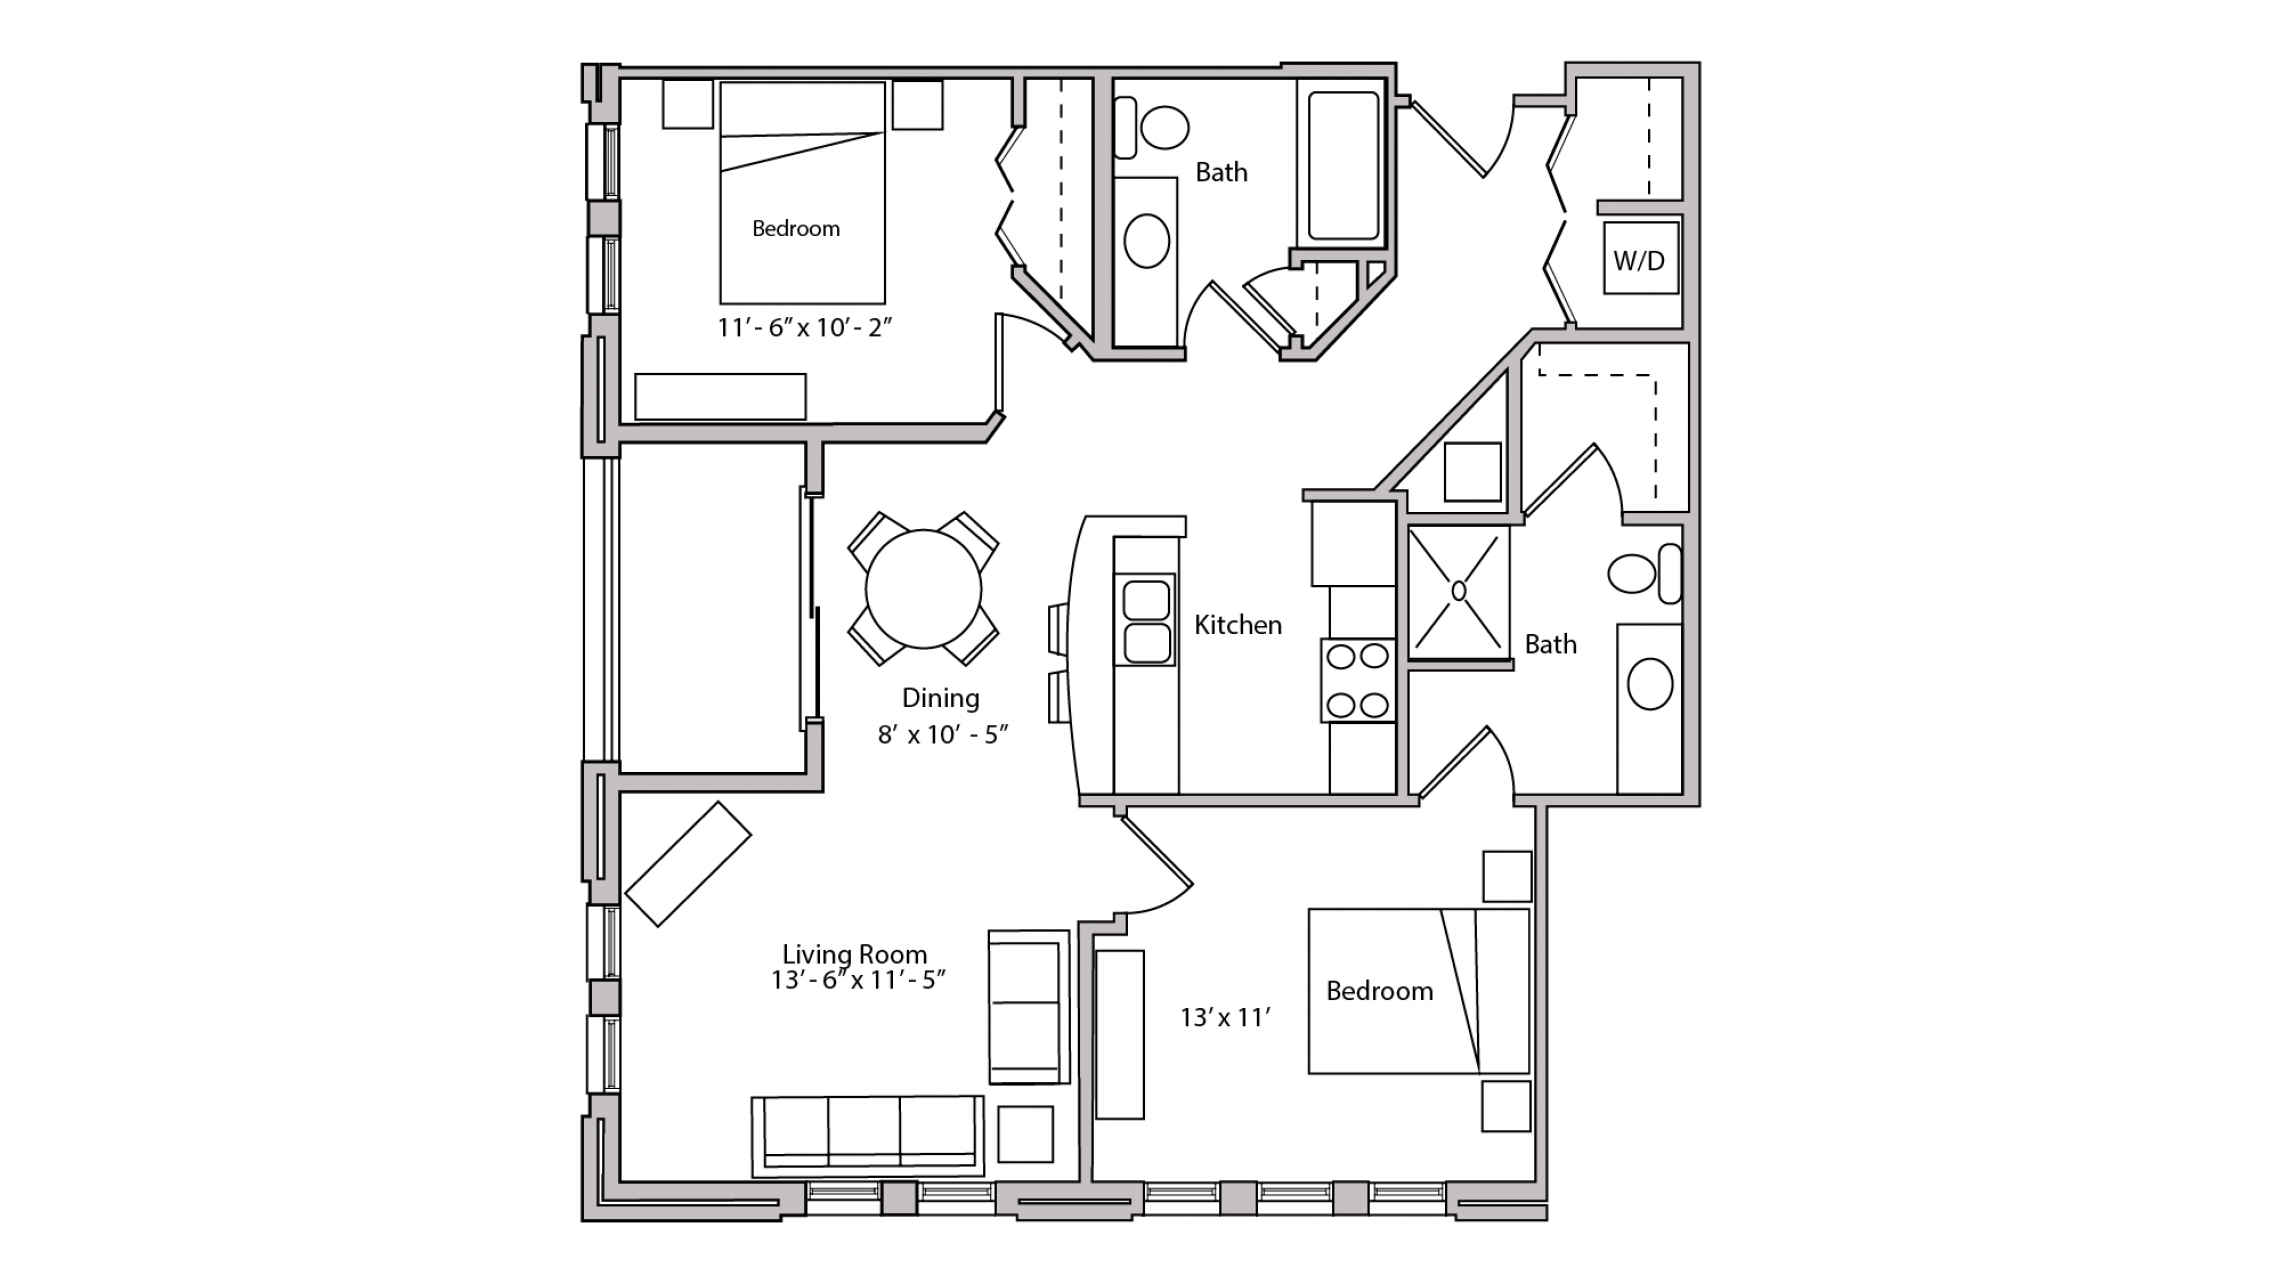 ULI The Depot 1-202 - Two Bedroom, Two Bathroom